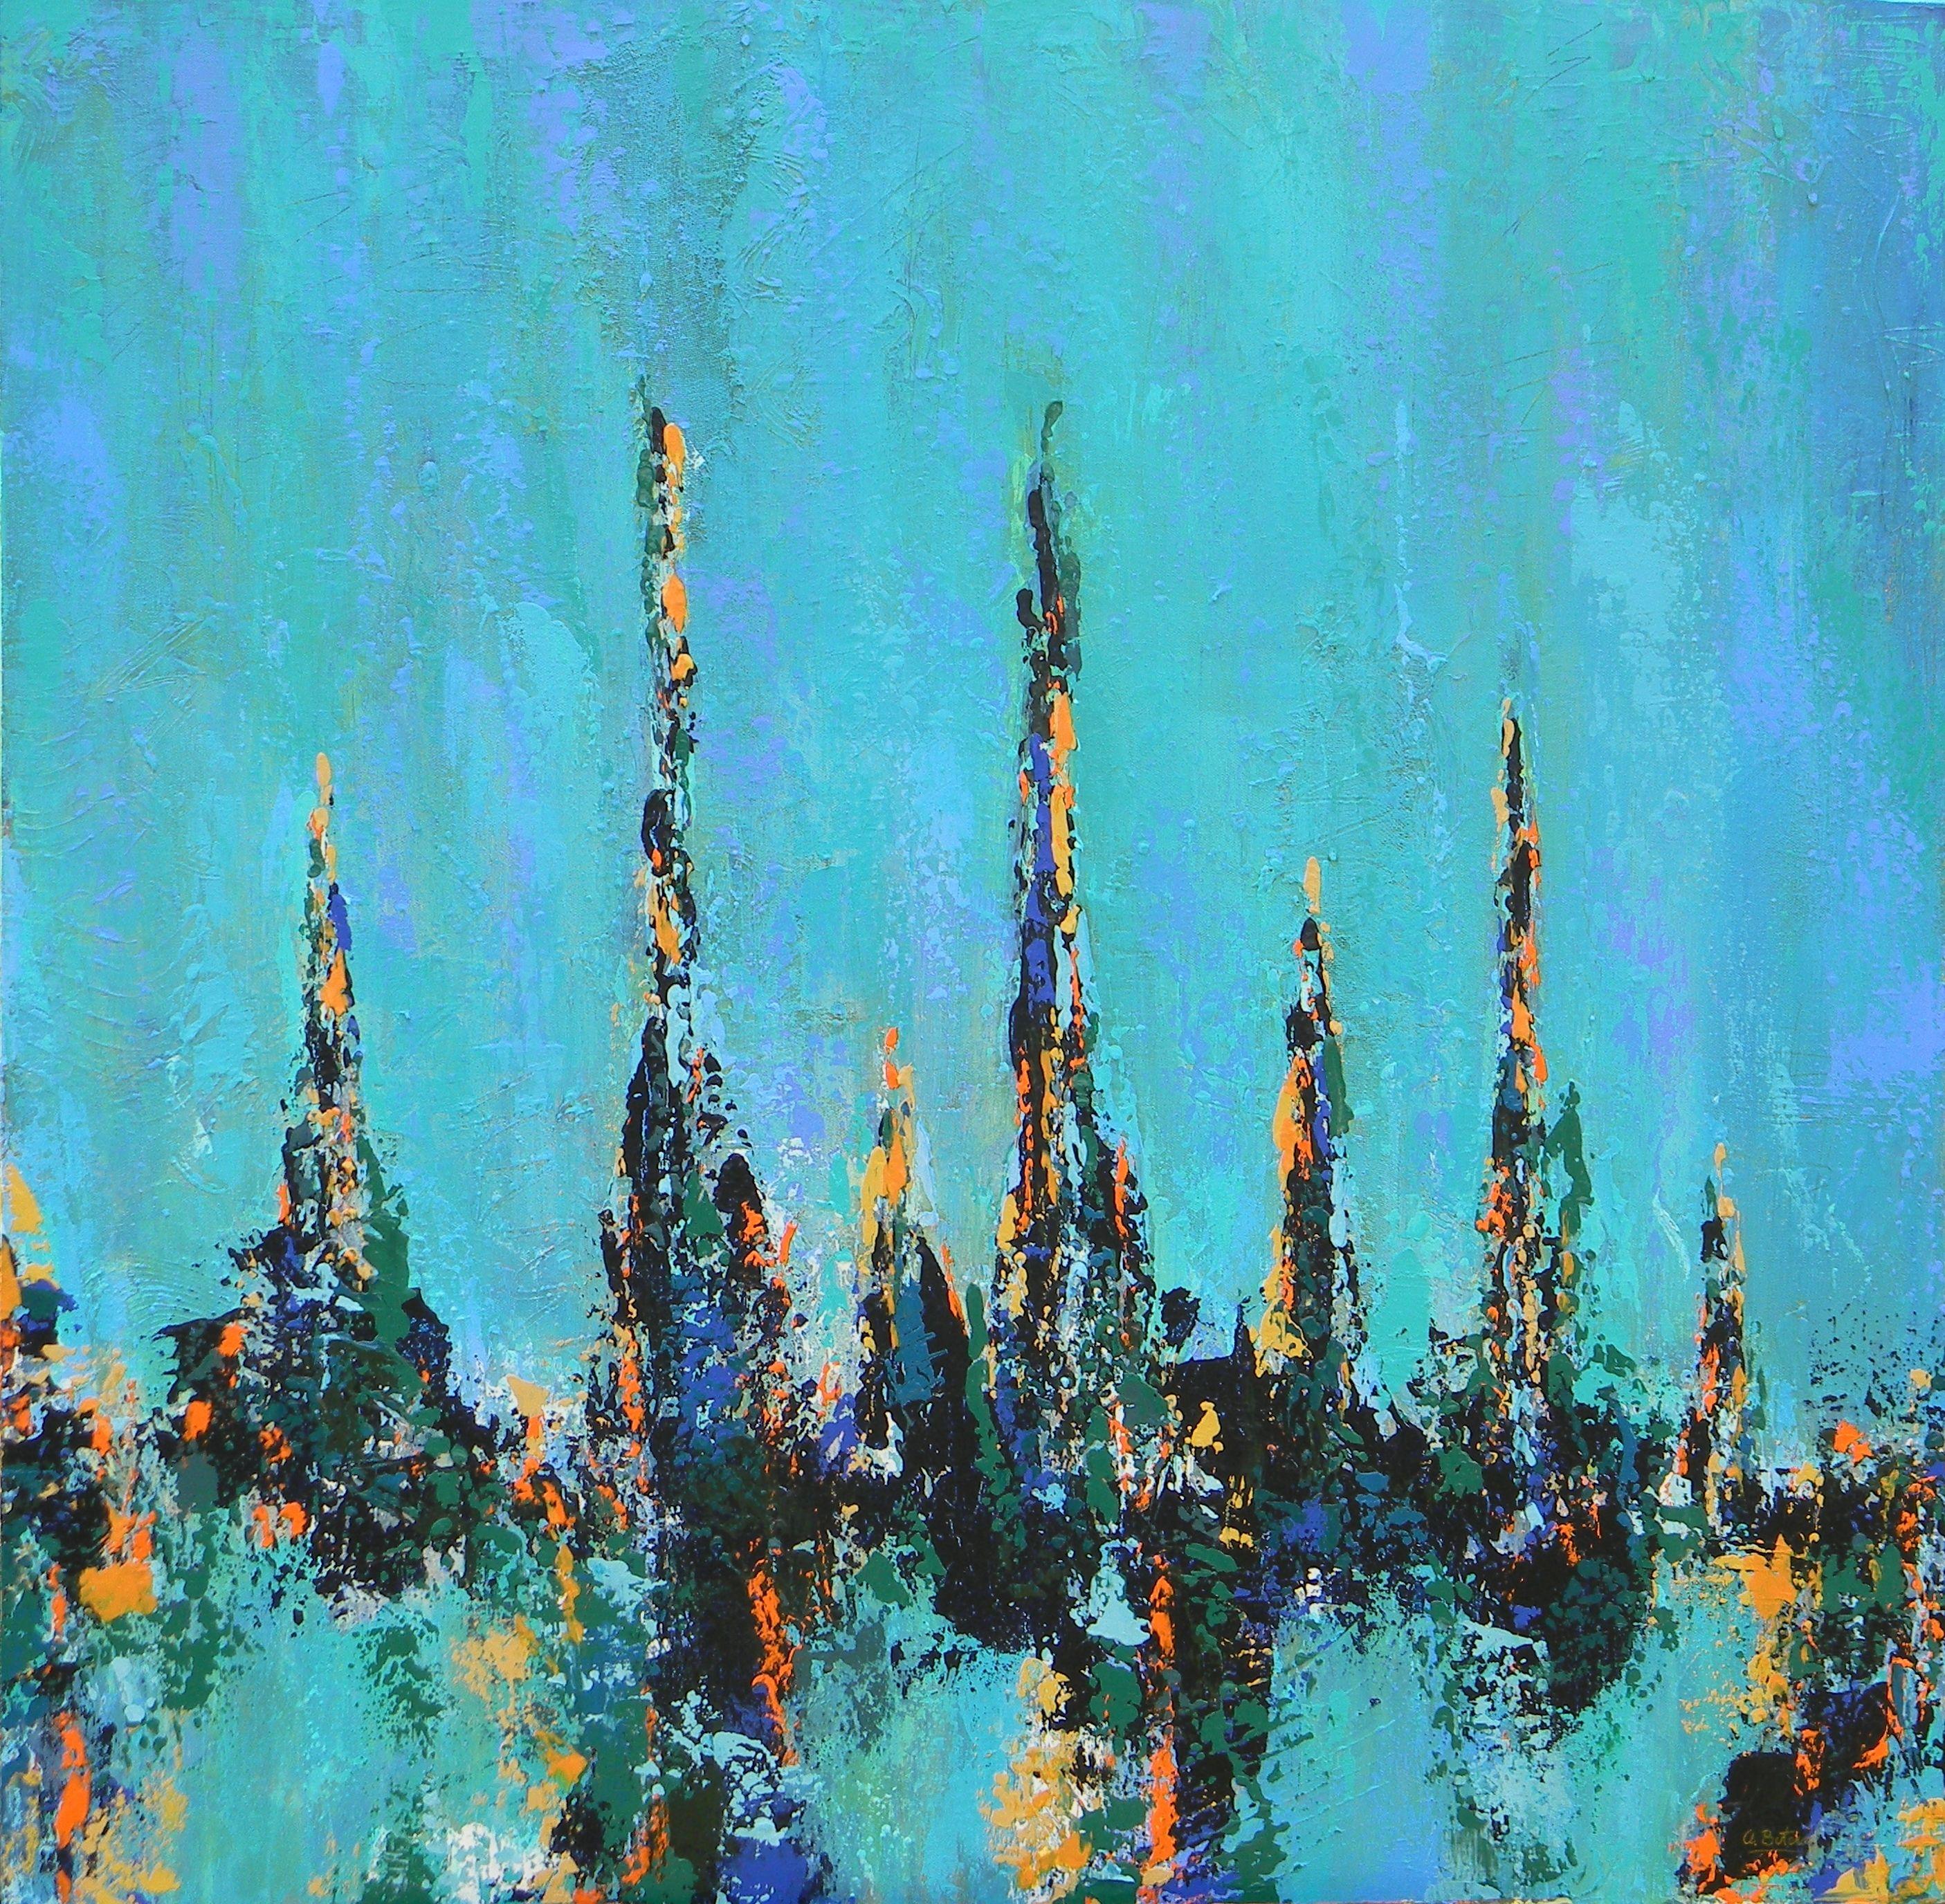 Blue Feelings by Ana Maria Botero